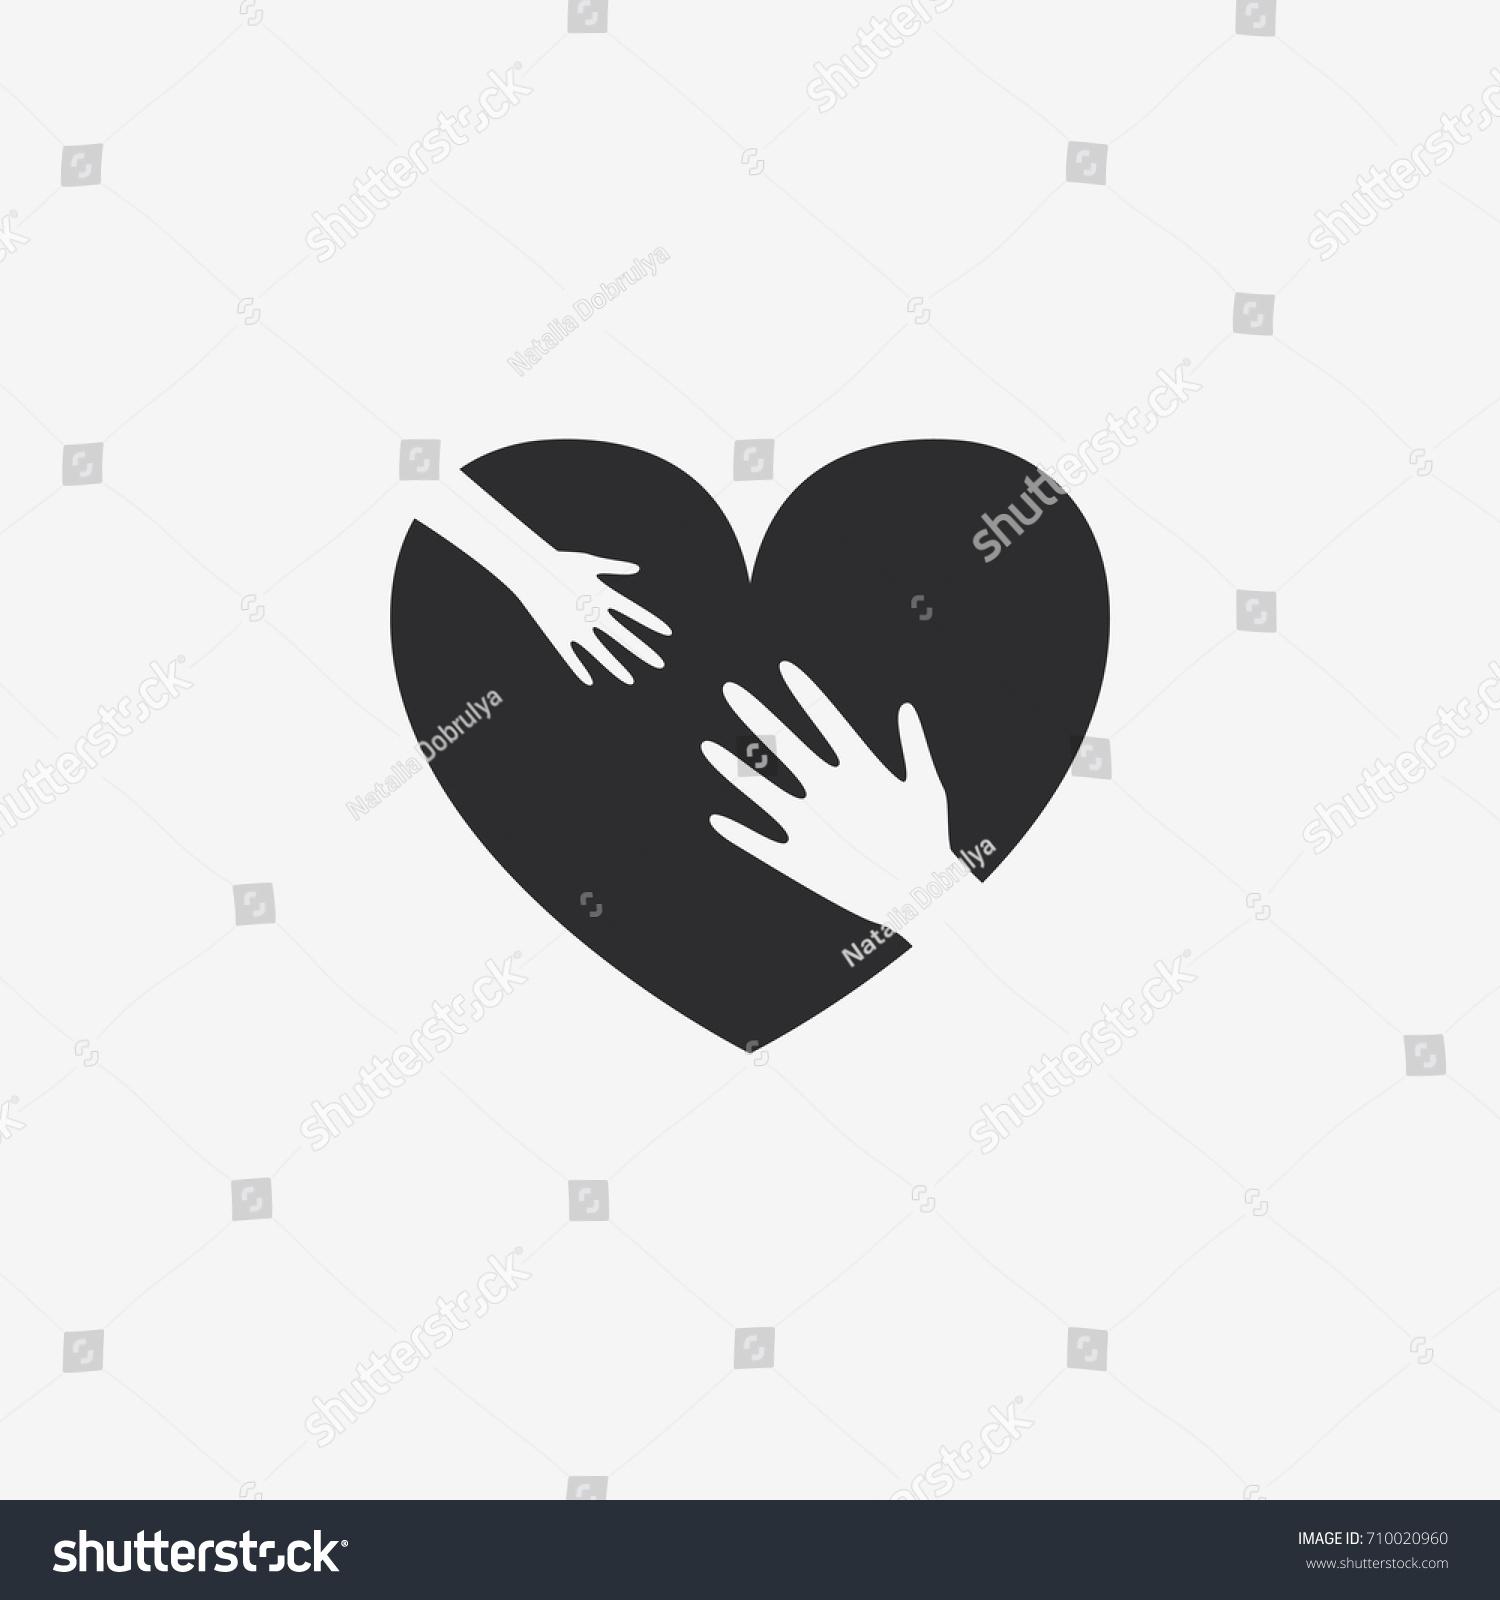 Symbol love help children vector icon stock vector 710020960 a symbol of love and help to children vector icon biocorpaavc Images